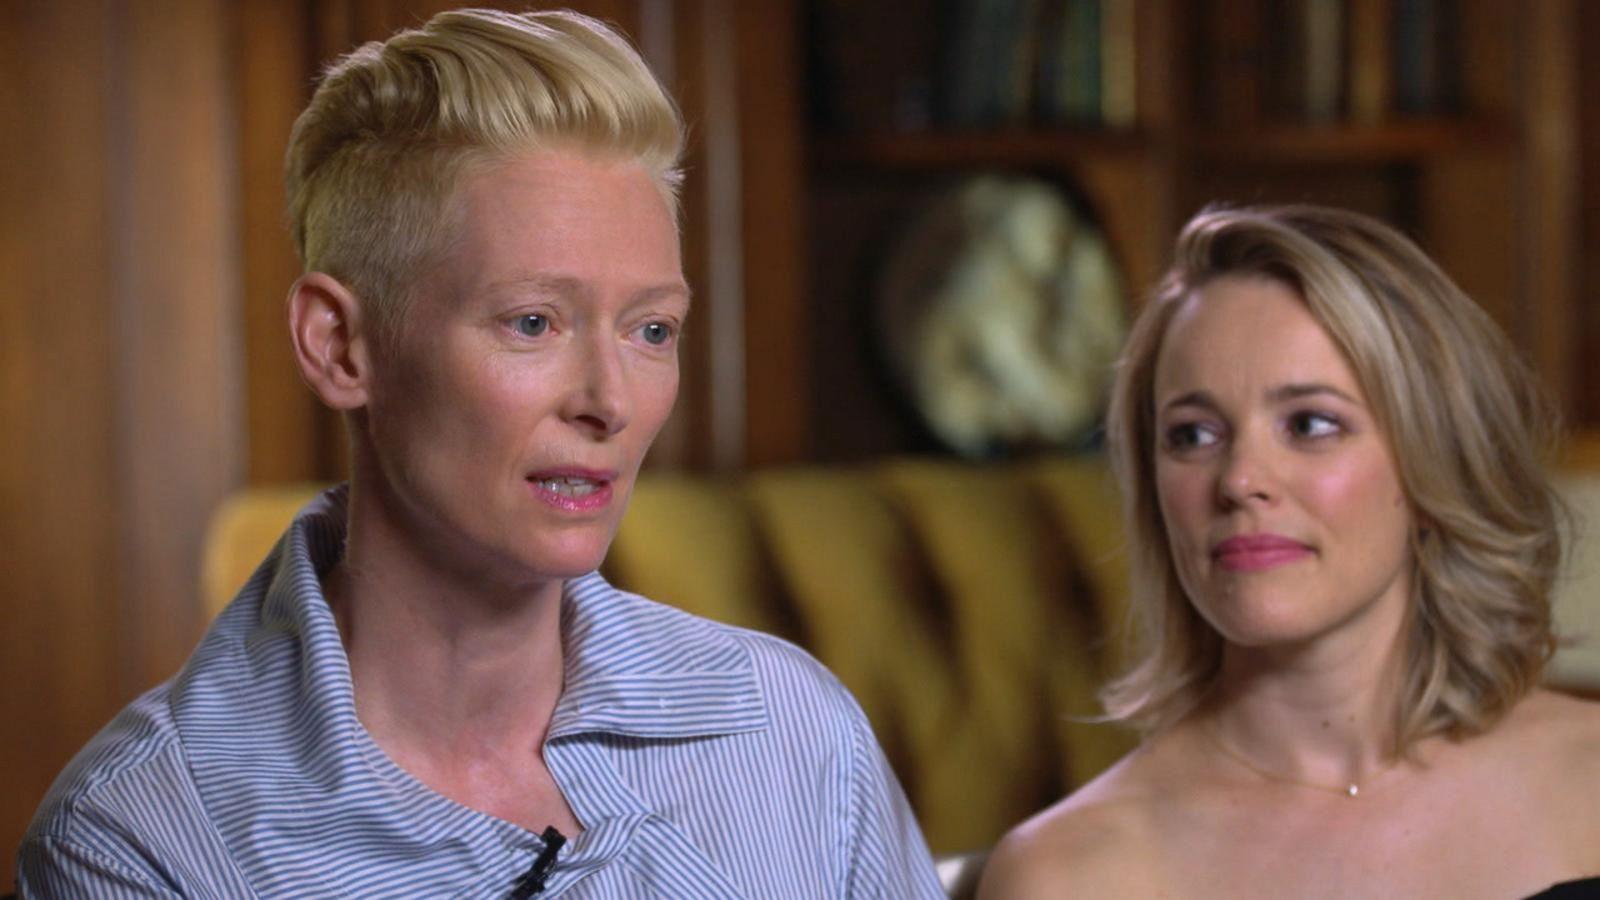 VIDEO: Tilda Swinton and Rachel McAdams Talk 'Dr. Strange'